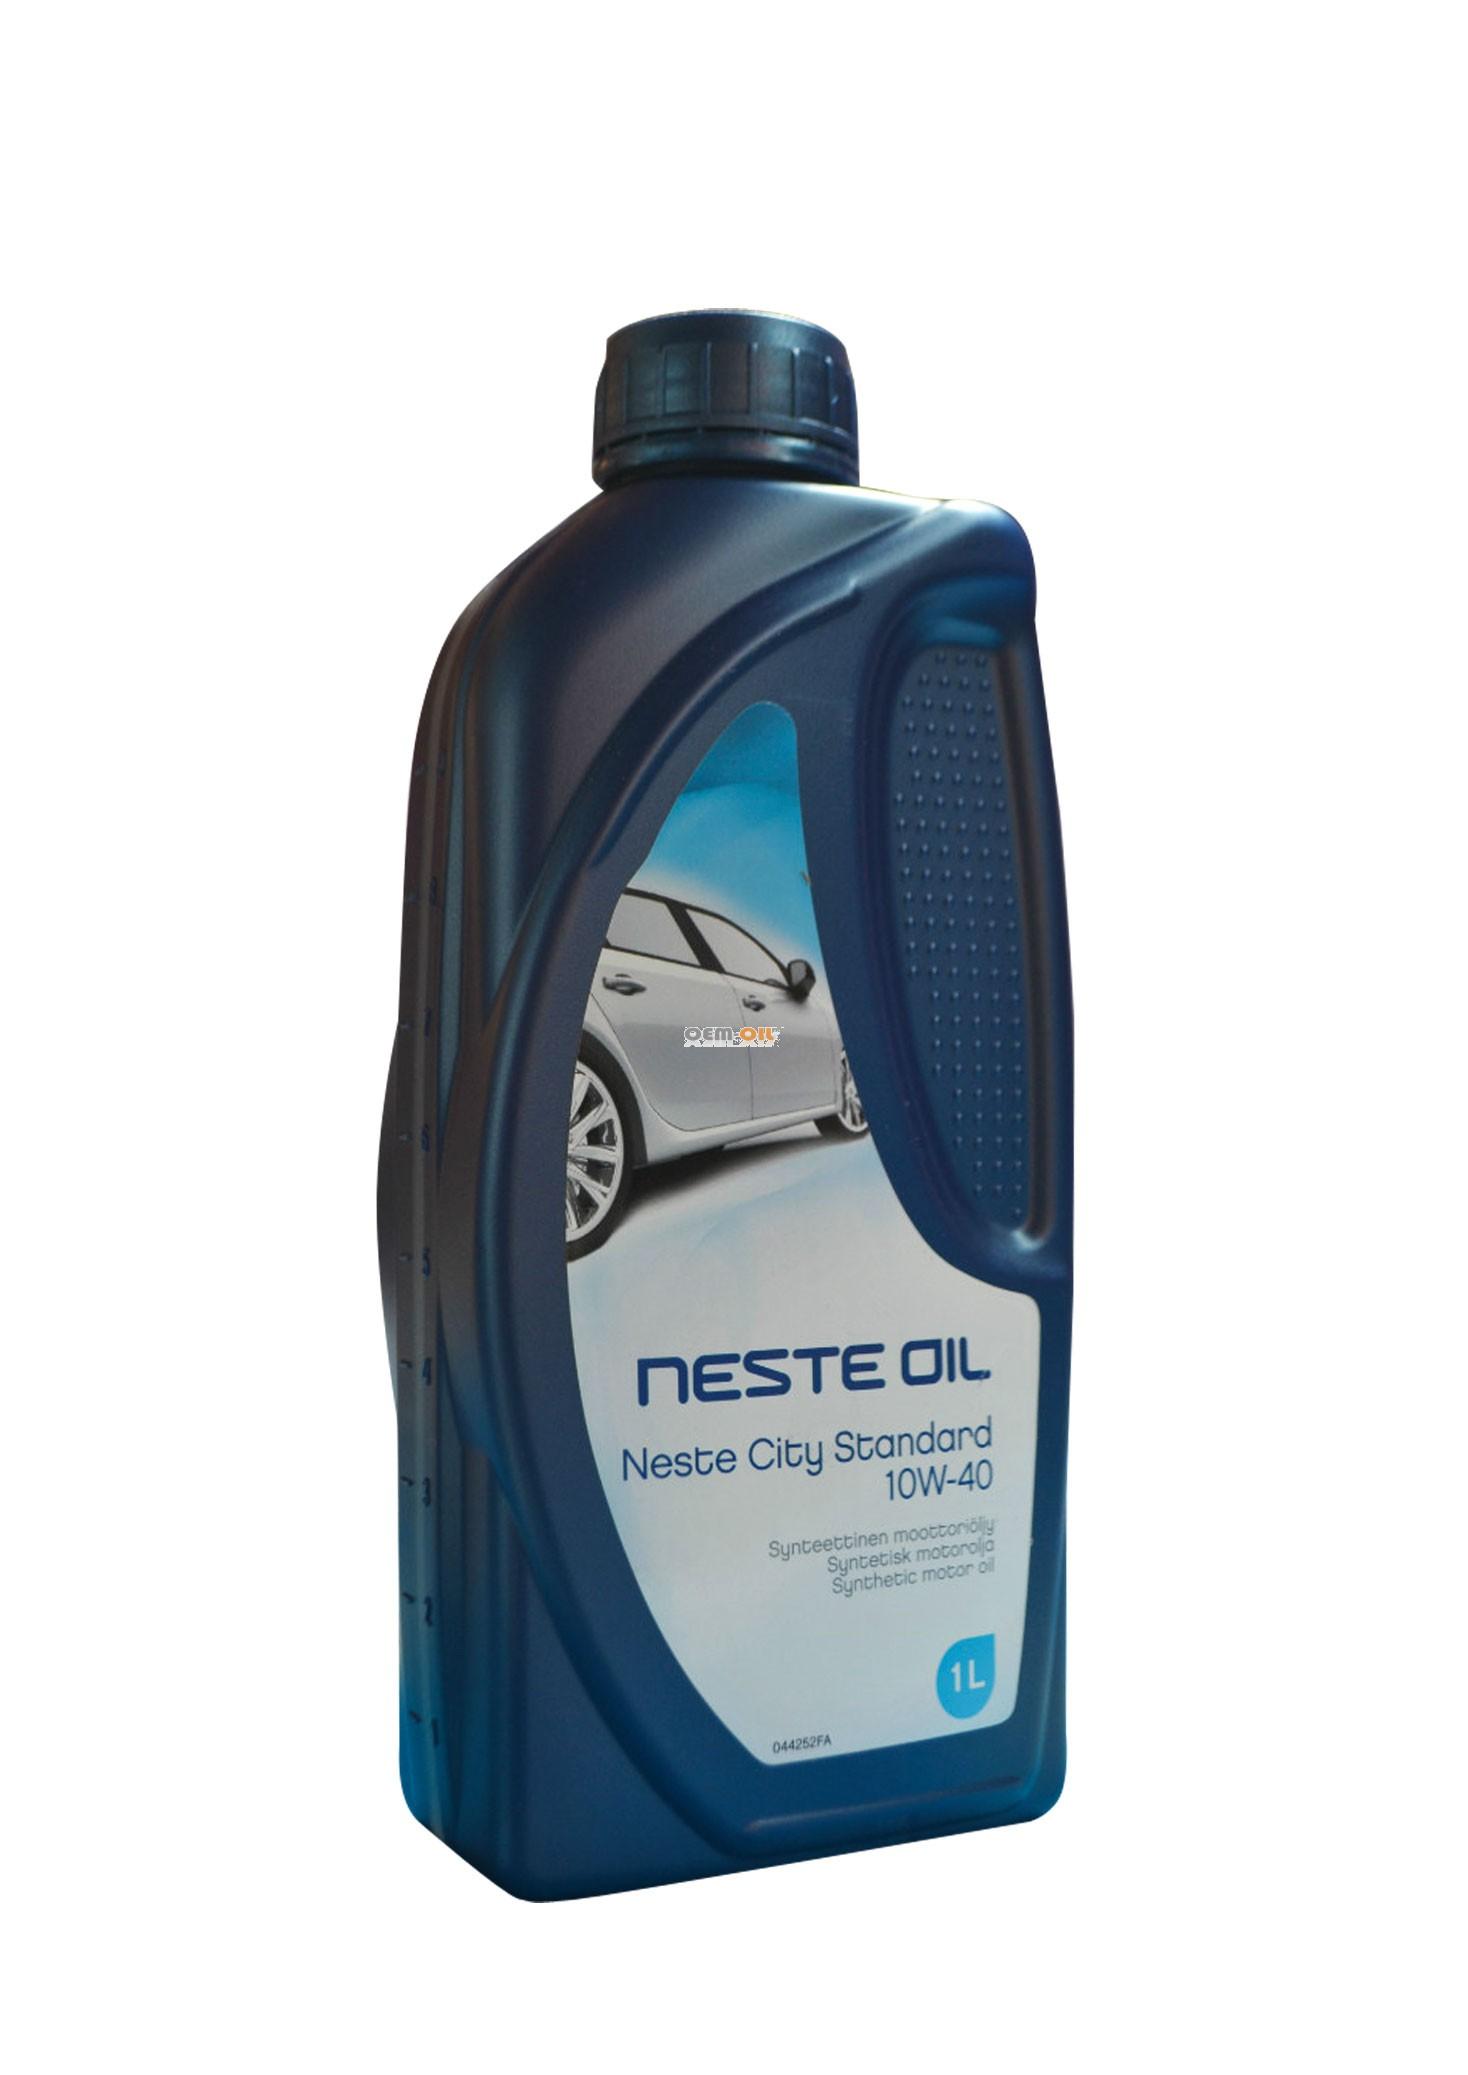 Neste City Standard SAE 10W-40